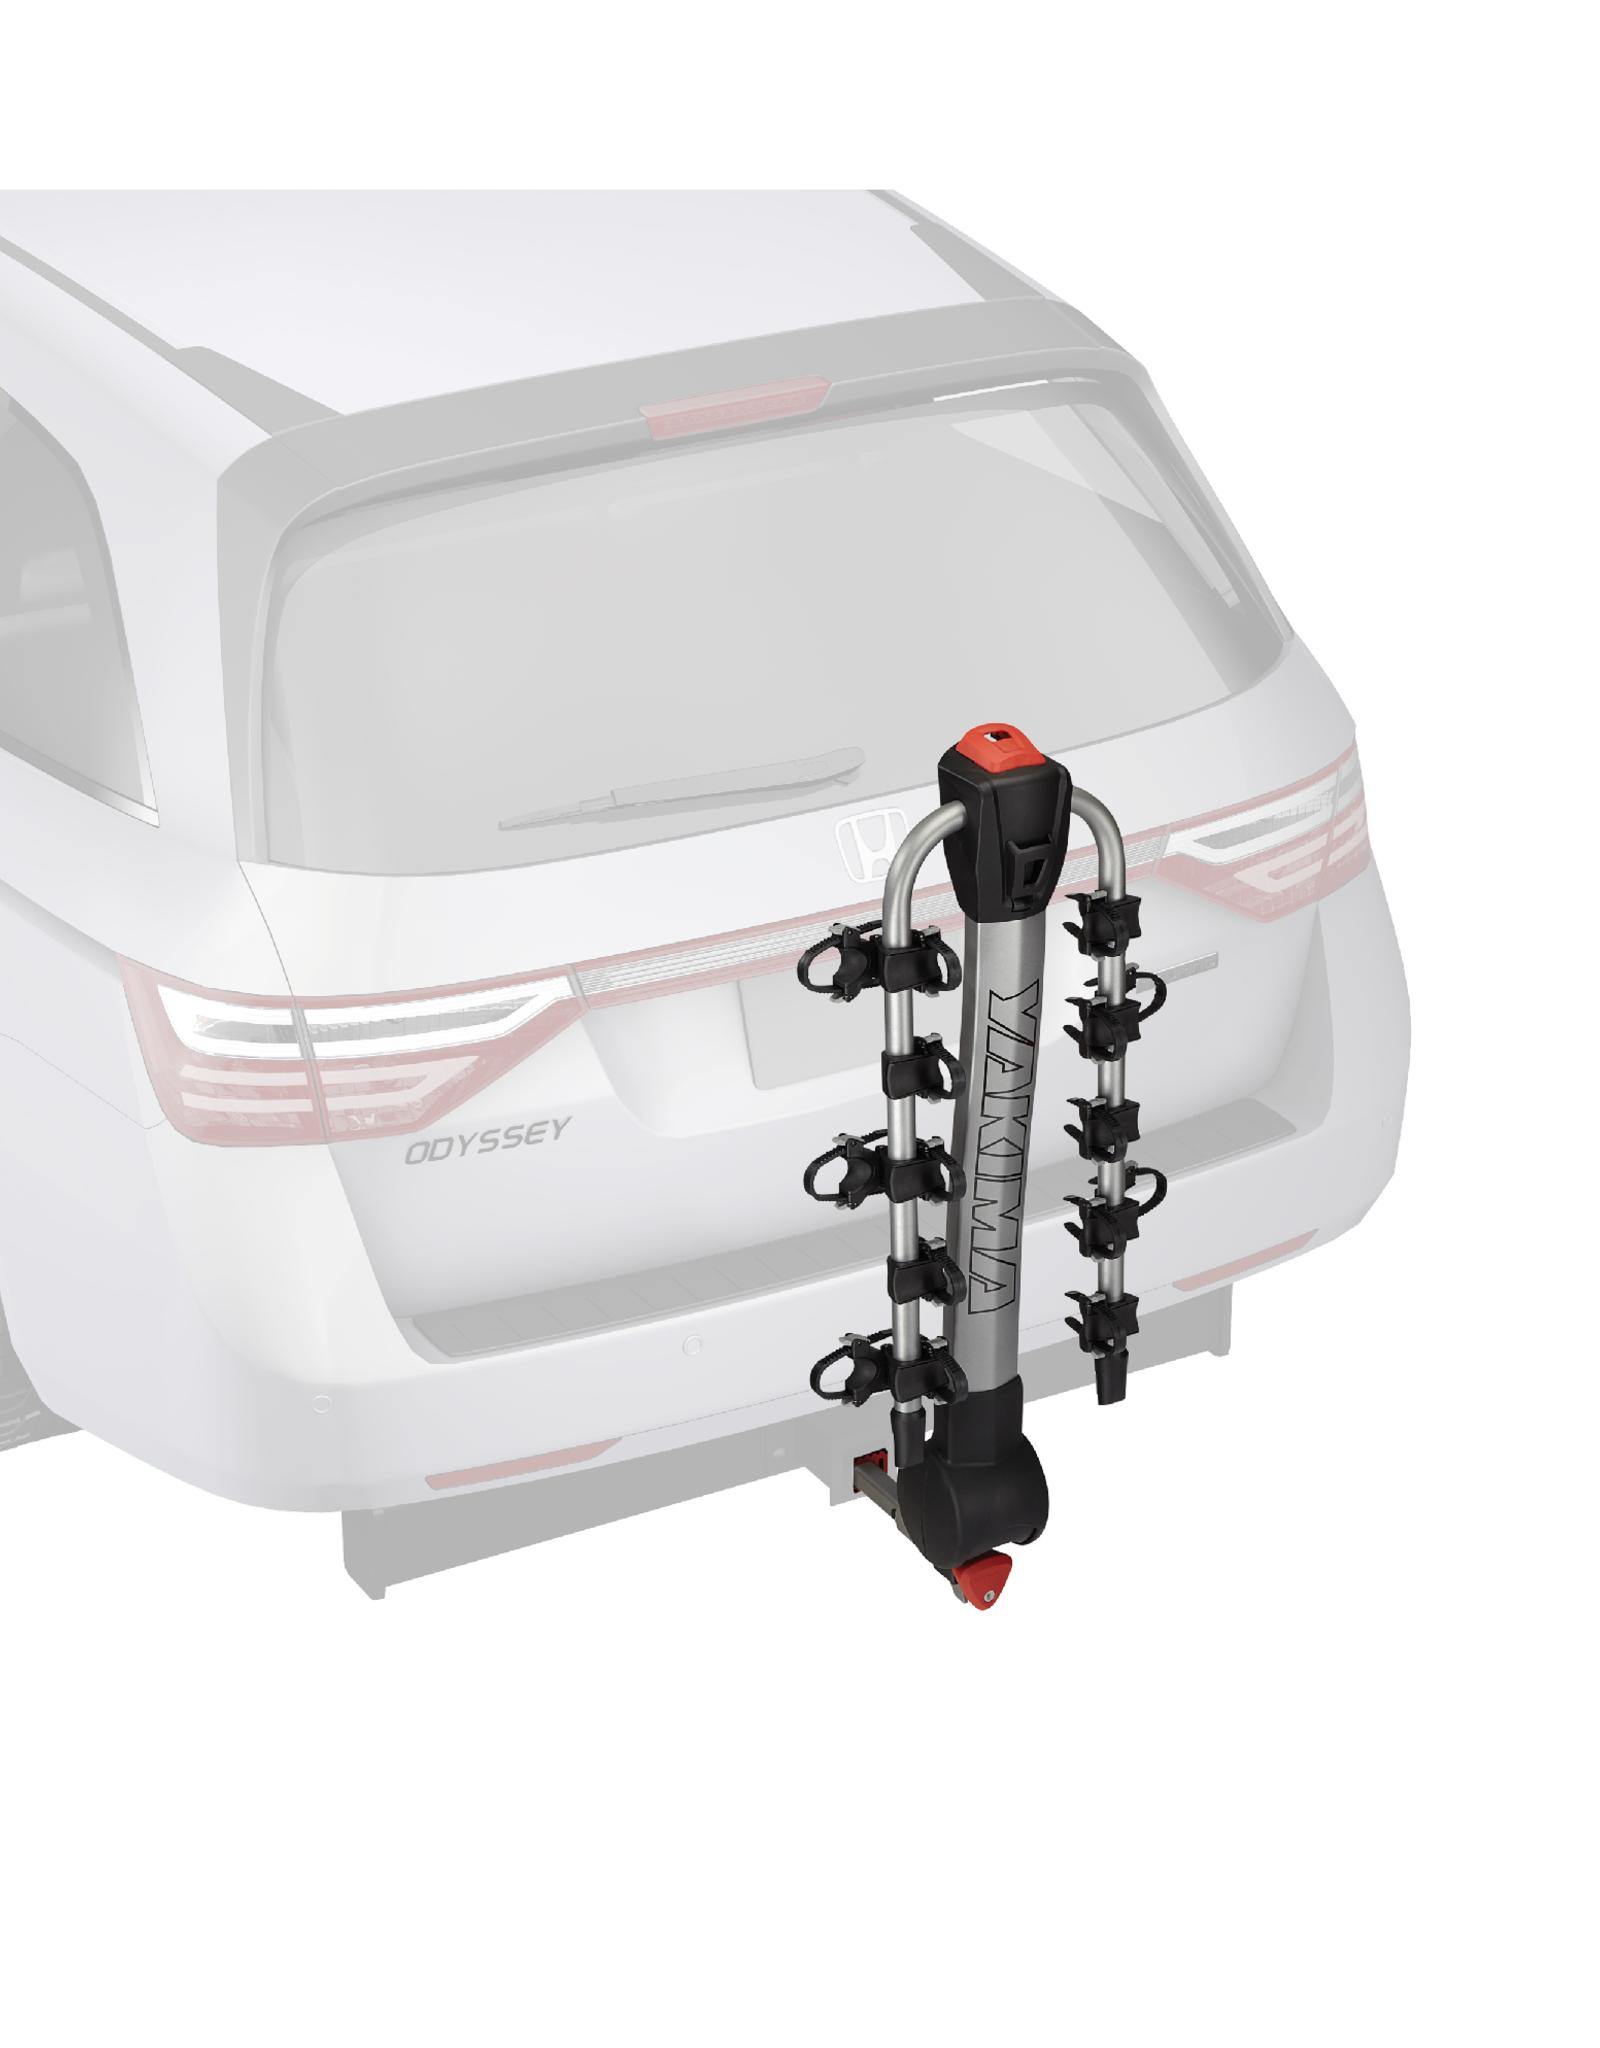 Car Rack - Ridgeback Universal Hitch 5